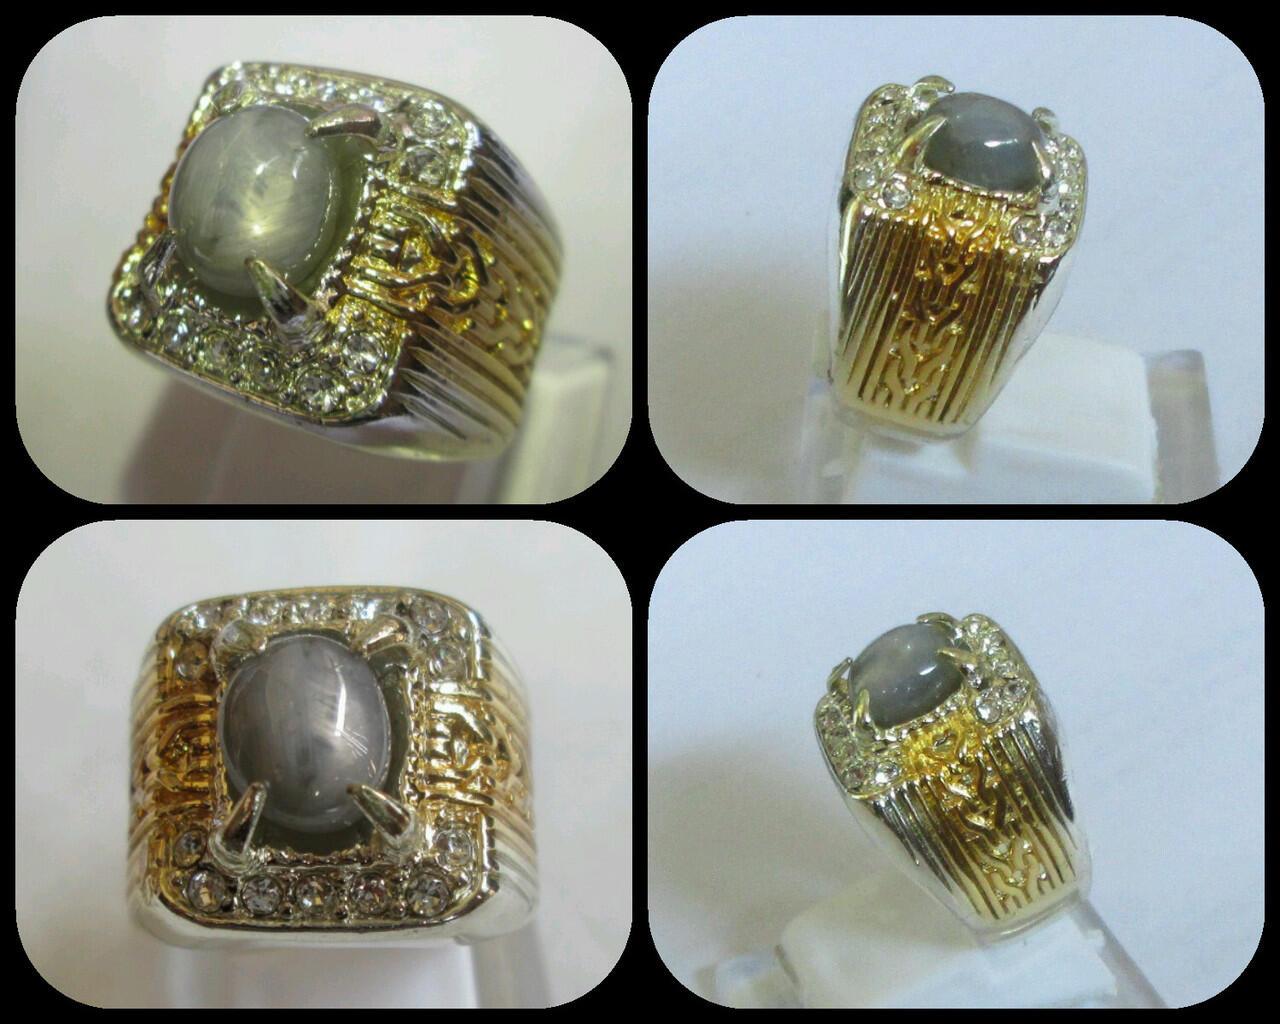 jual cincin kalimaya, black safir, ruby, nephrit, safir burma, citrine N mata dewa